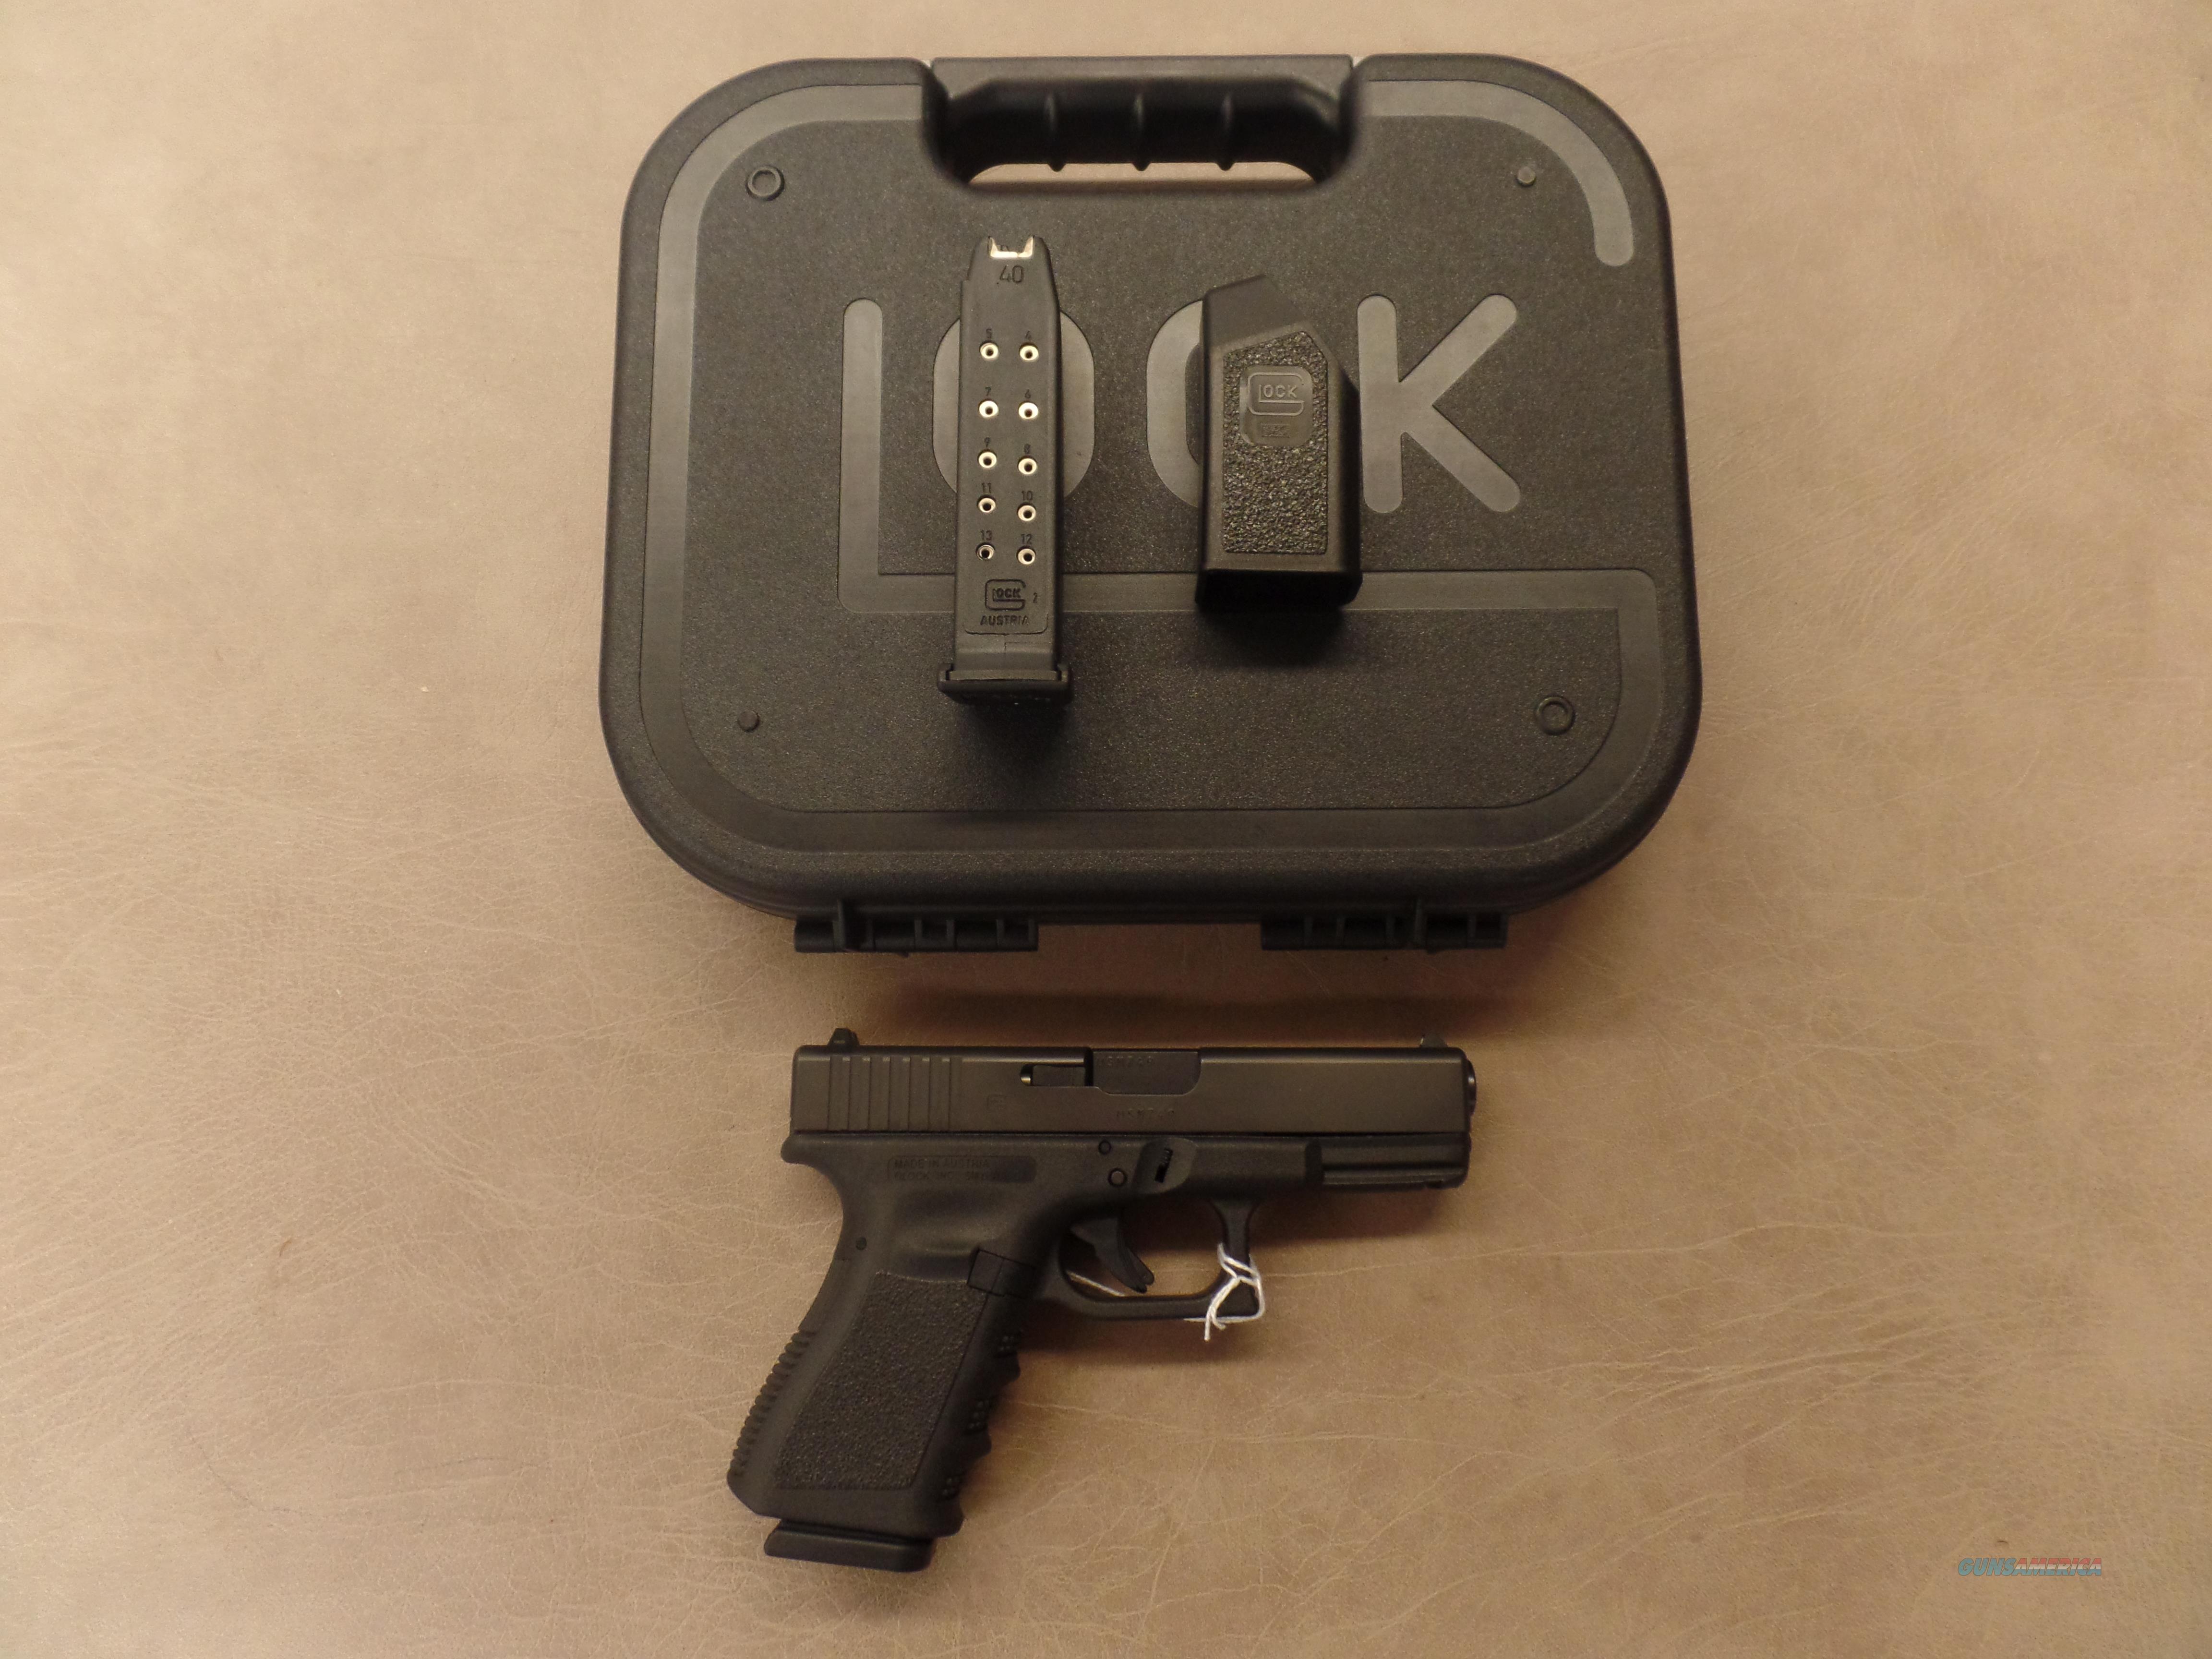 Glock 23 (40 S&W)  Guns > Pistols > Glock Pistols > 23